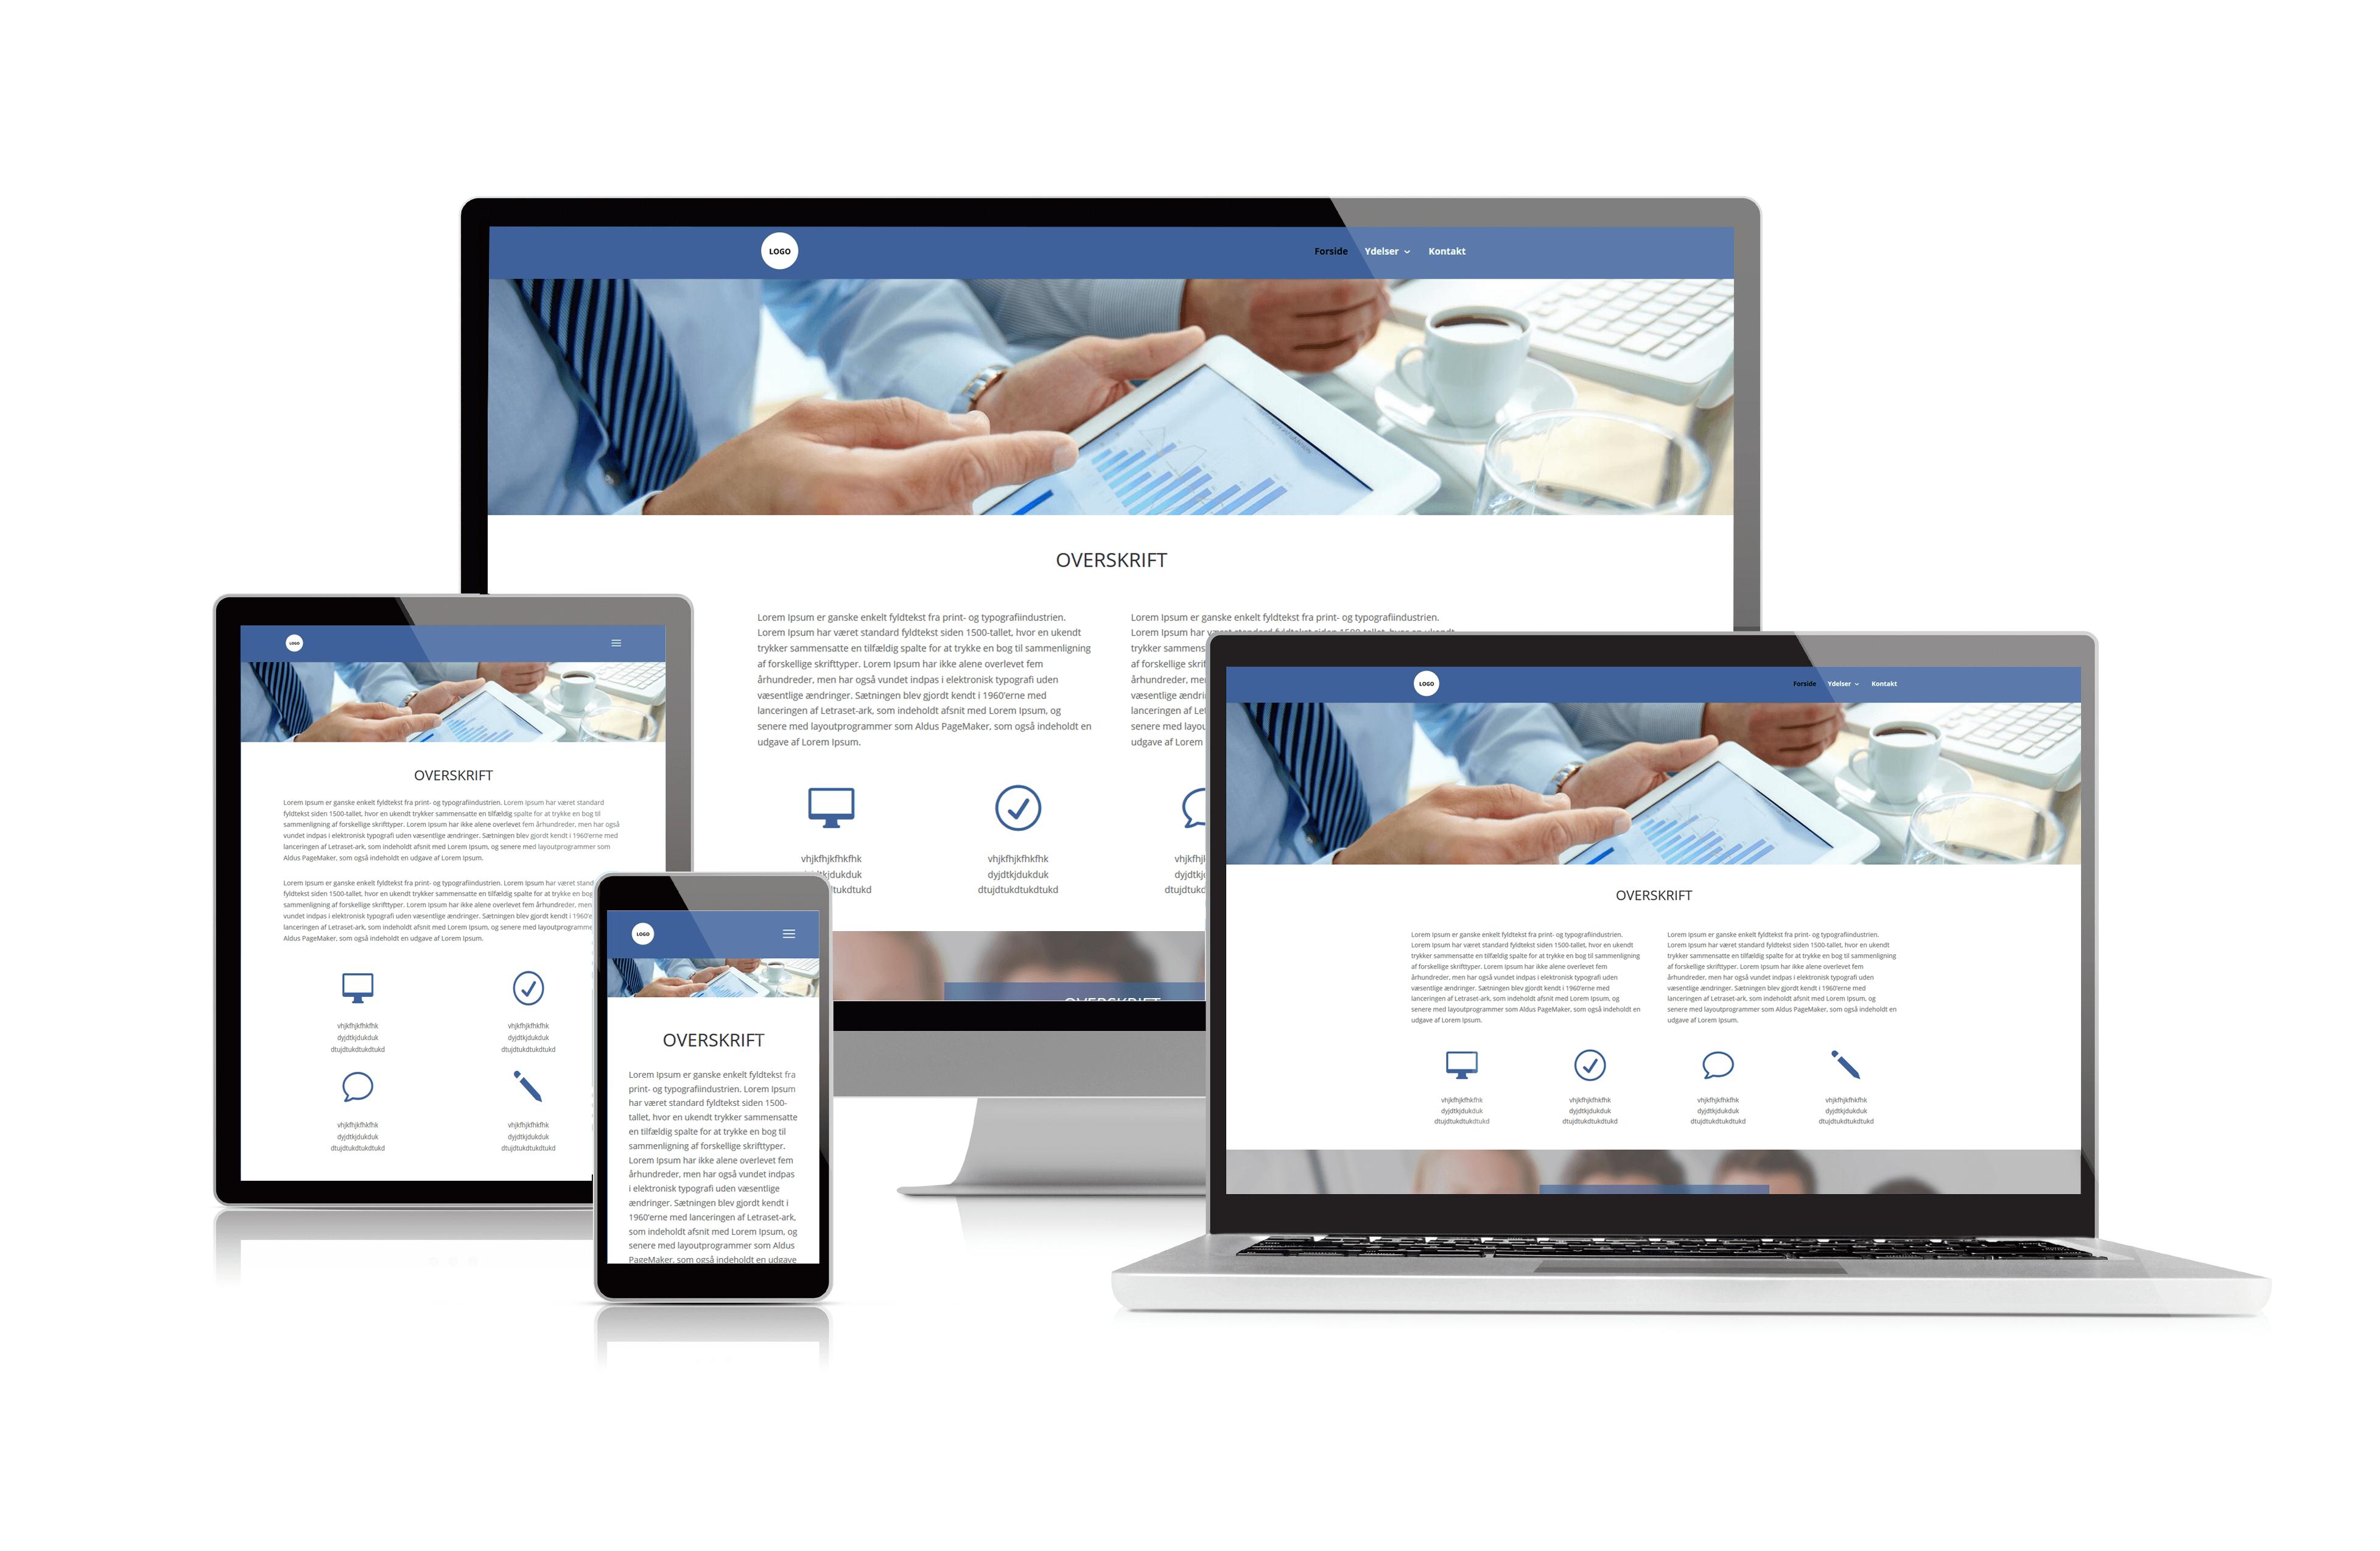 Professionel hjemmeside inkl. SEO-tekster, SEO-analyse og webdesign